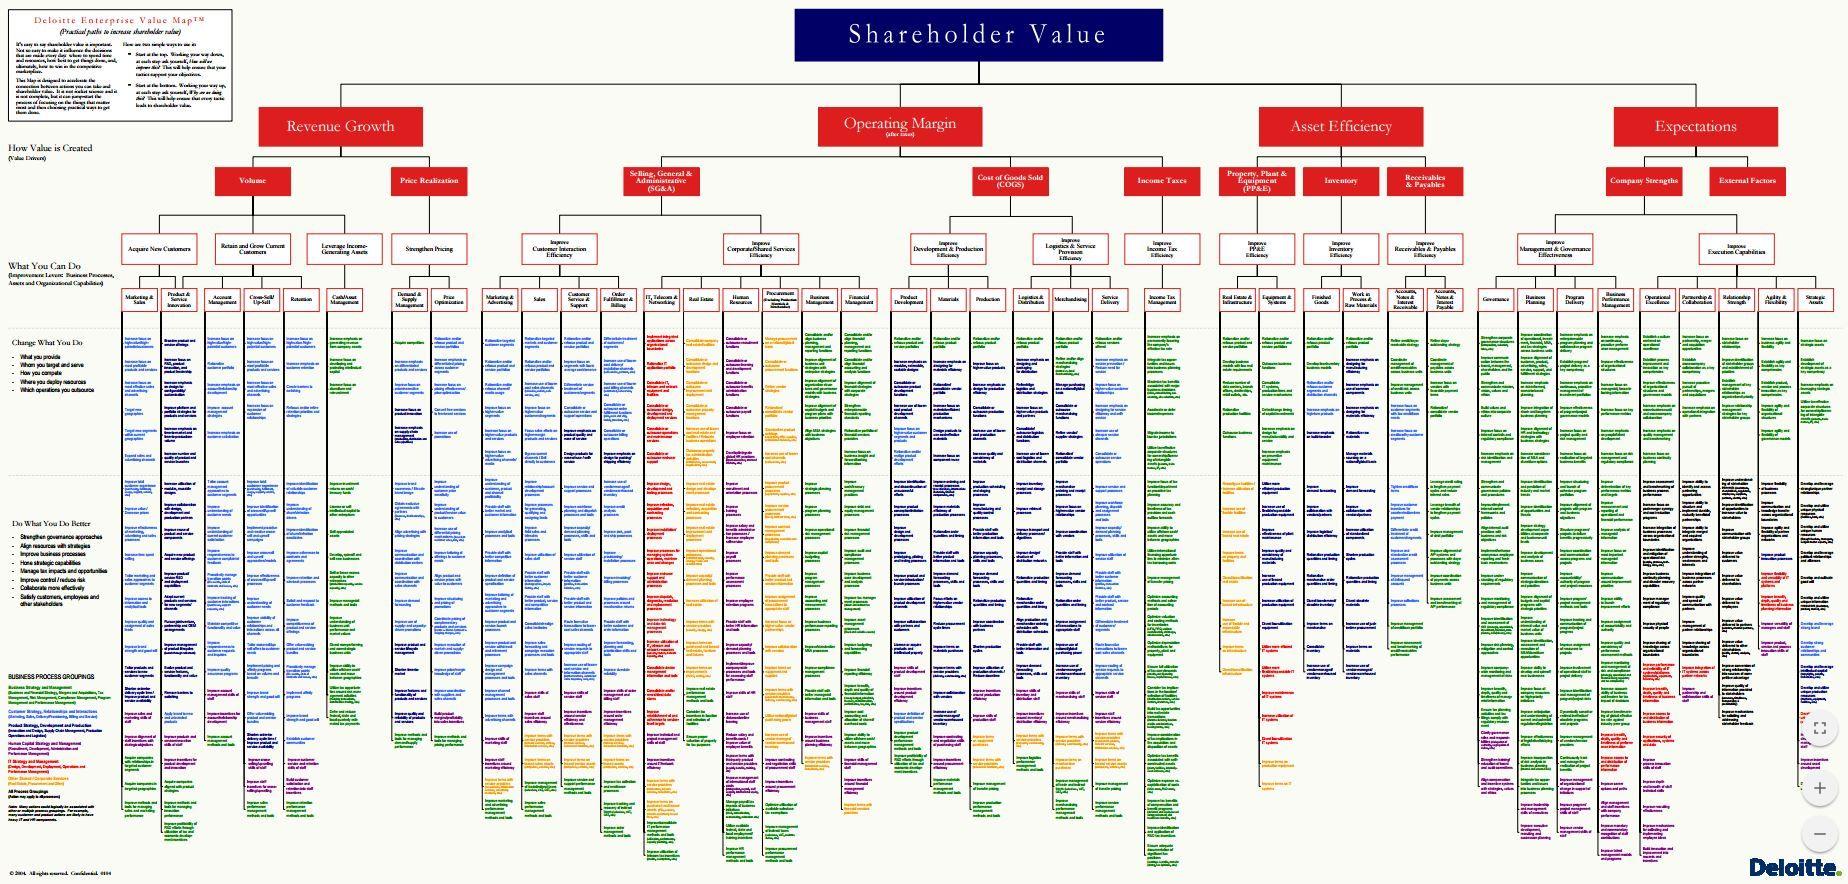 Entreprise Value Map From Deloitte